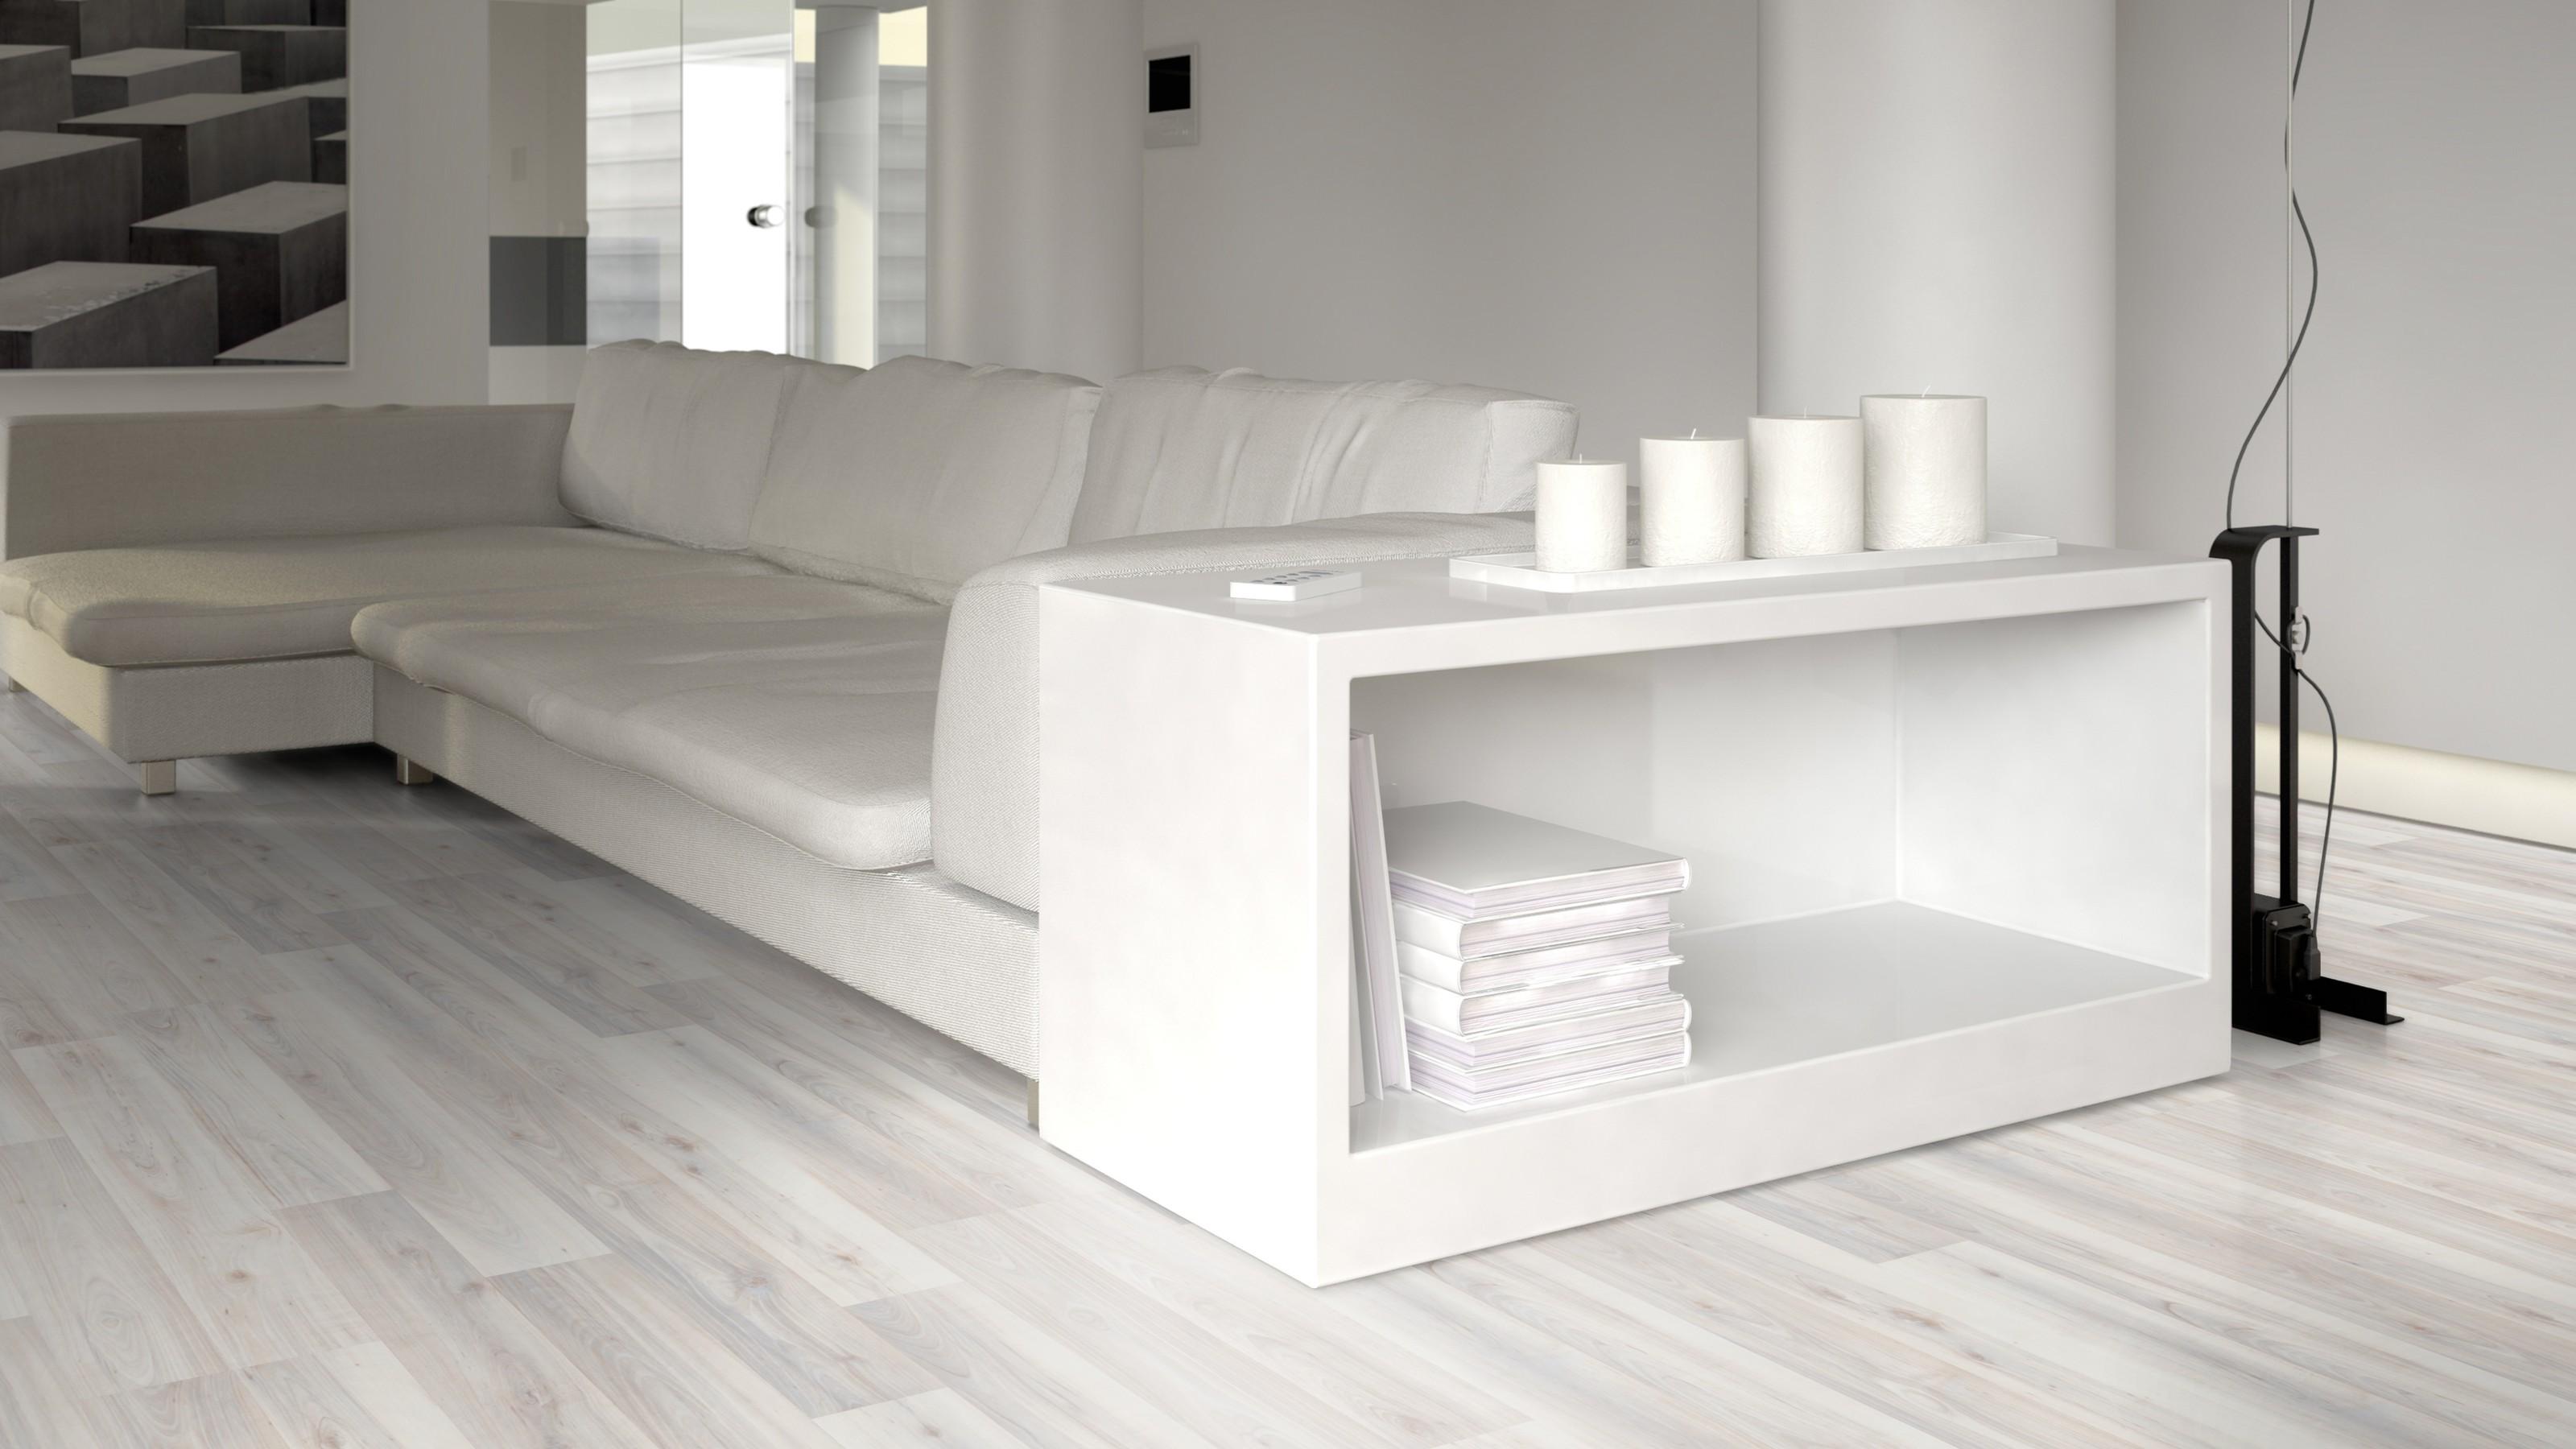 kronotex dynamic laminat birnbaum wei d3078 holzoptik preisbrecher 24 gmbh laminat. Black Bedroom Furniture Sets. Home Design Ideas